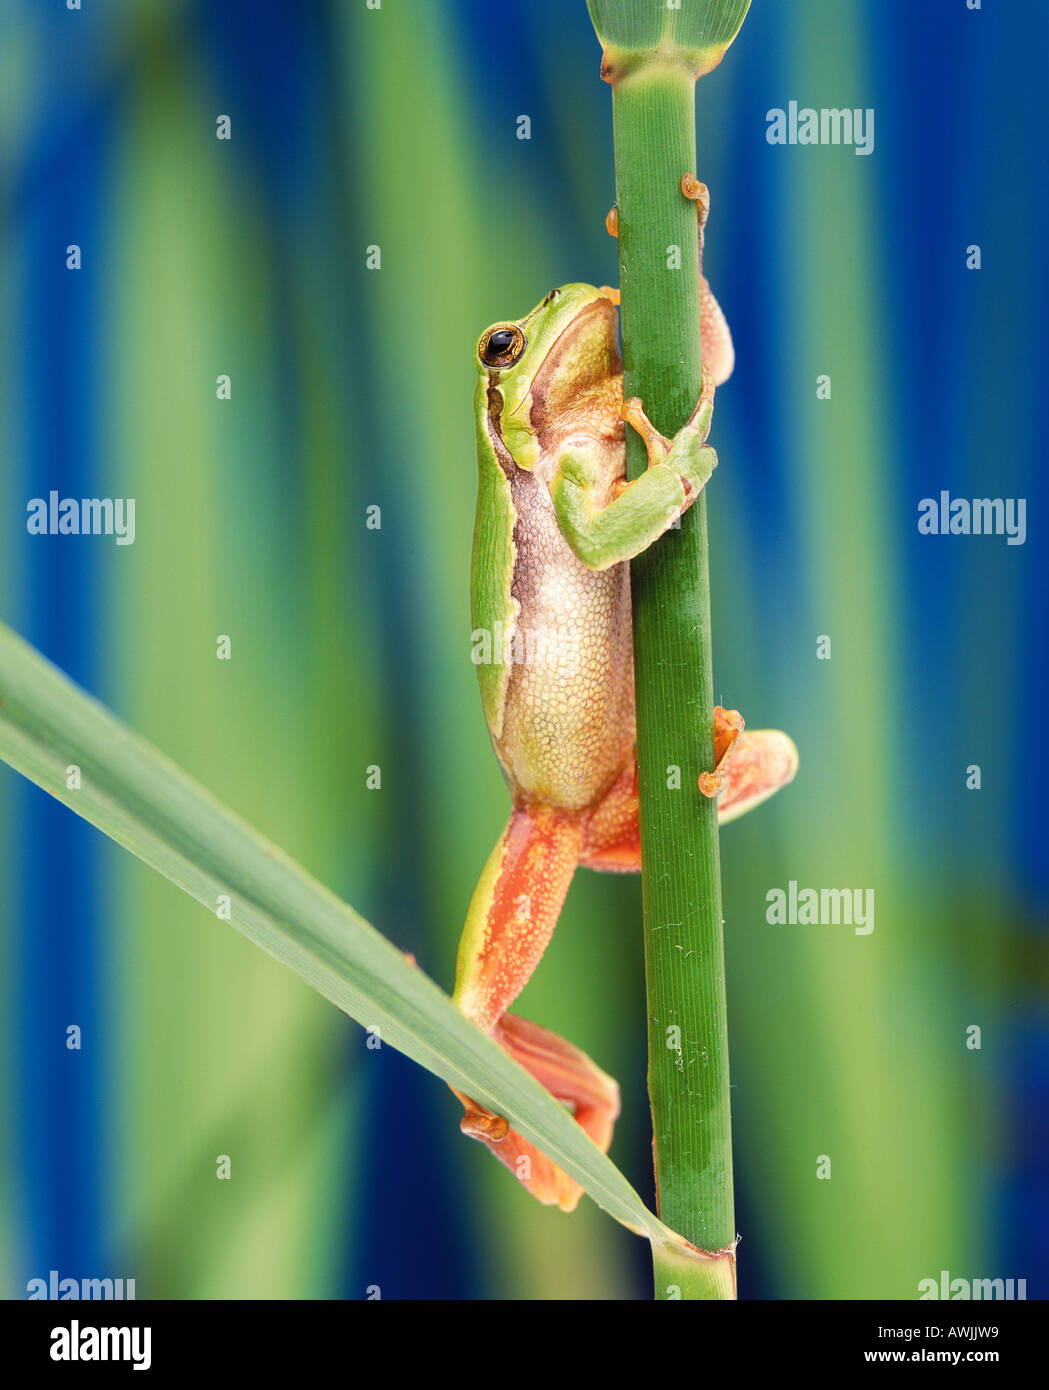 European tree frog (Hyla arborea) climbing on reed stalk - Stock Image